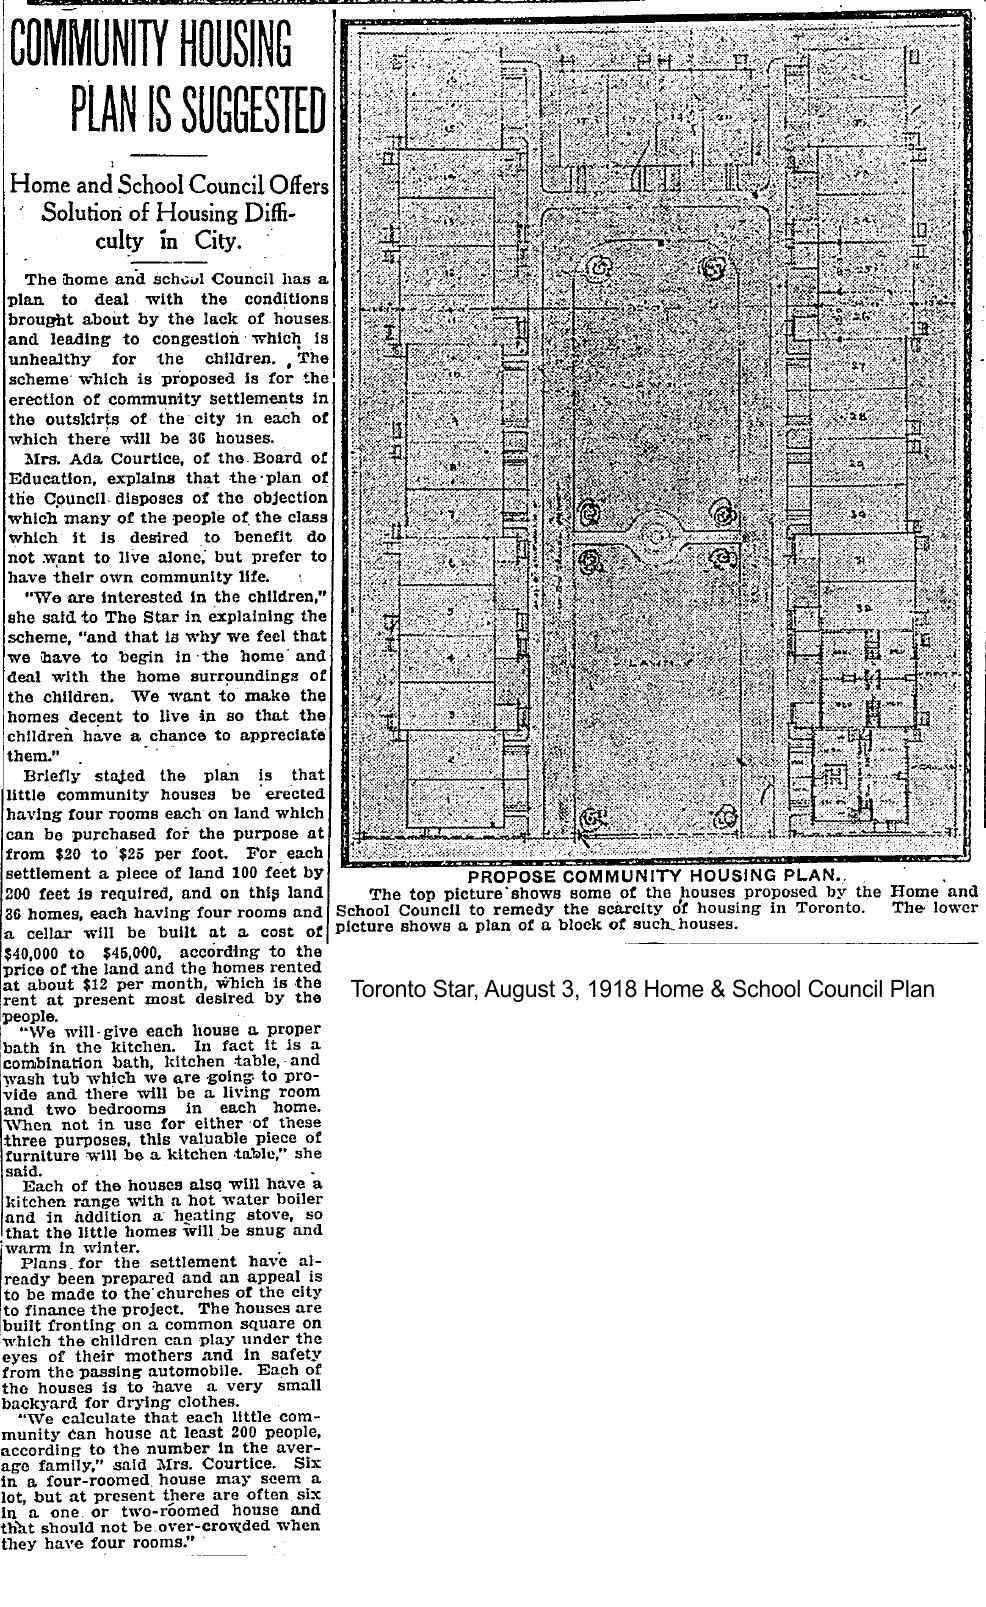 toronto-star-august-3-1918-home-school-council-plan